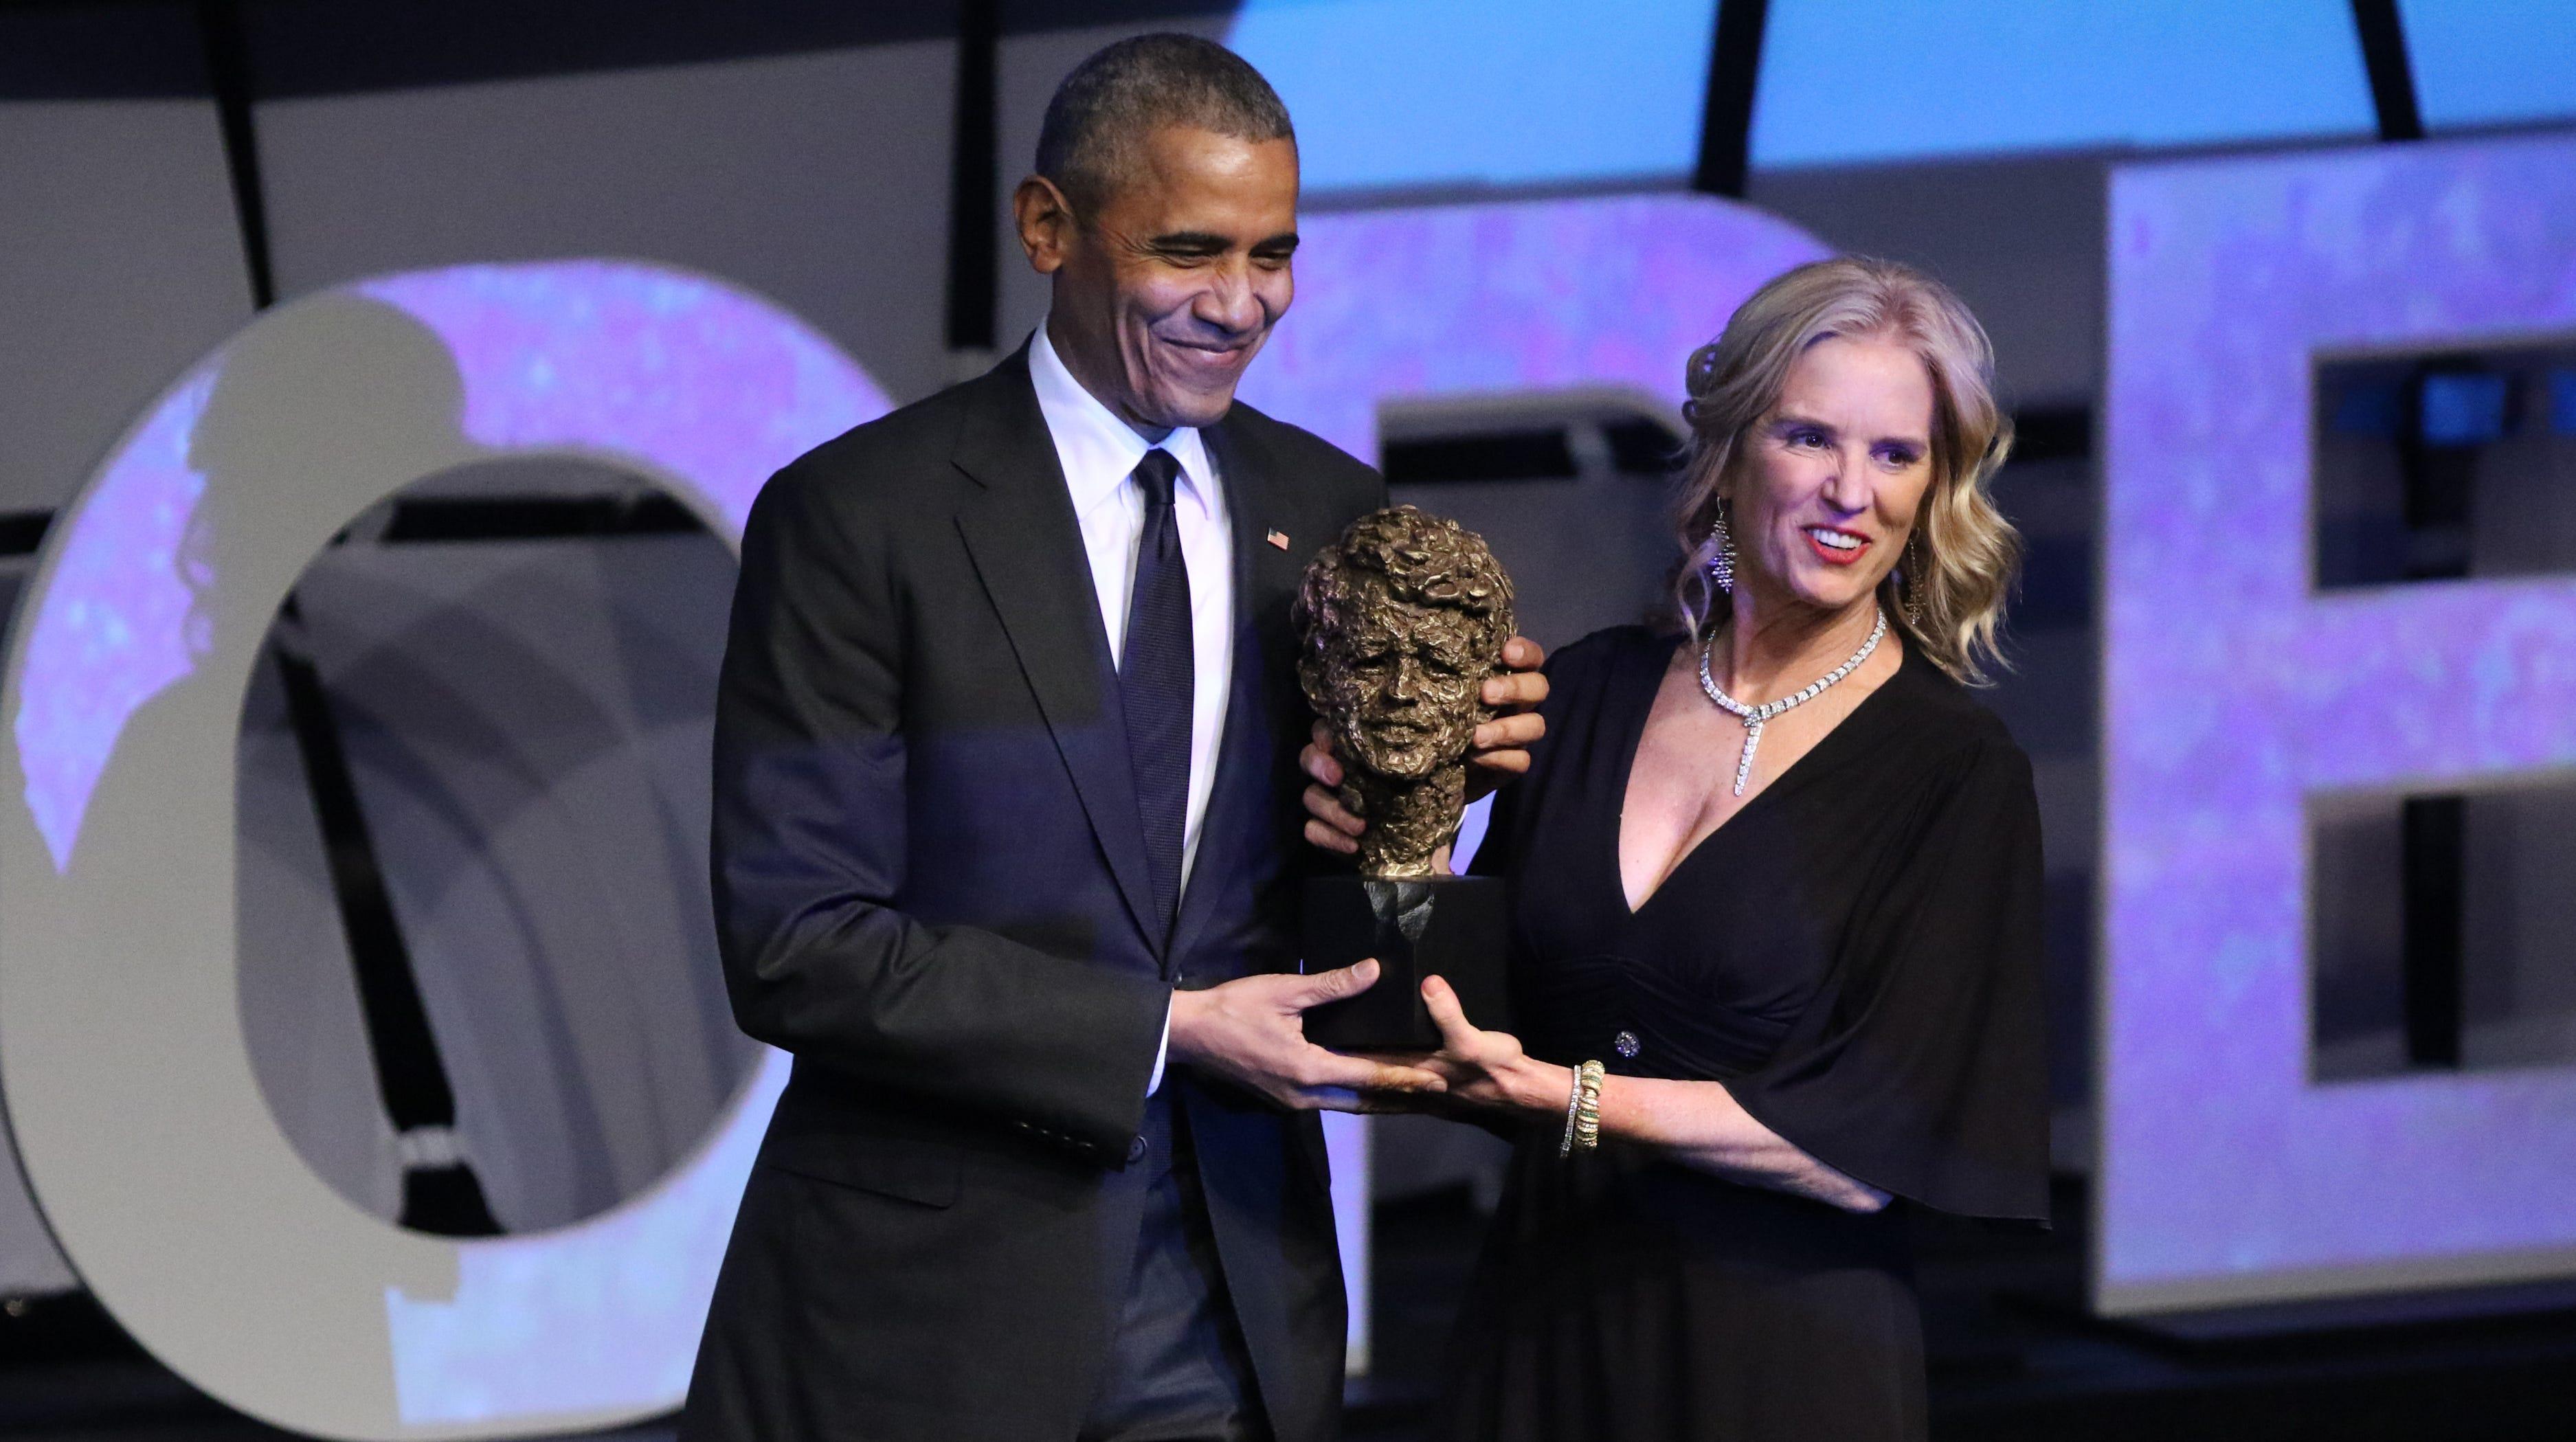 Pres. Obama, Gov. Murphy, among celebrities at Kennedy award gala